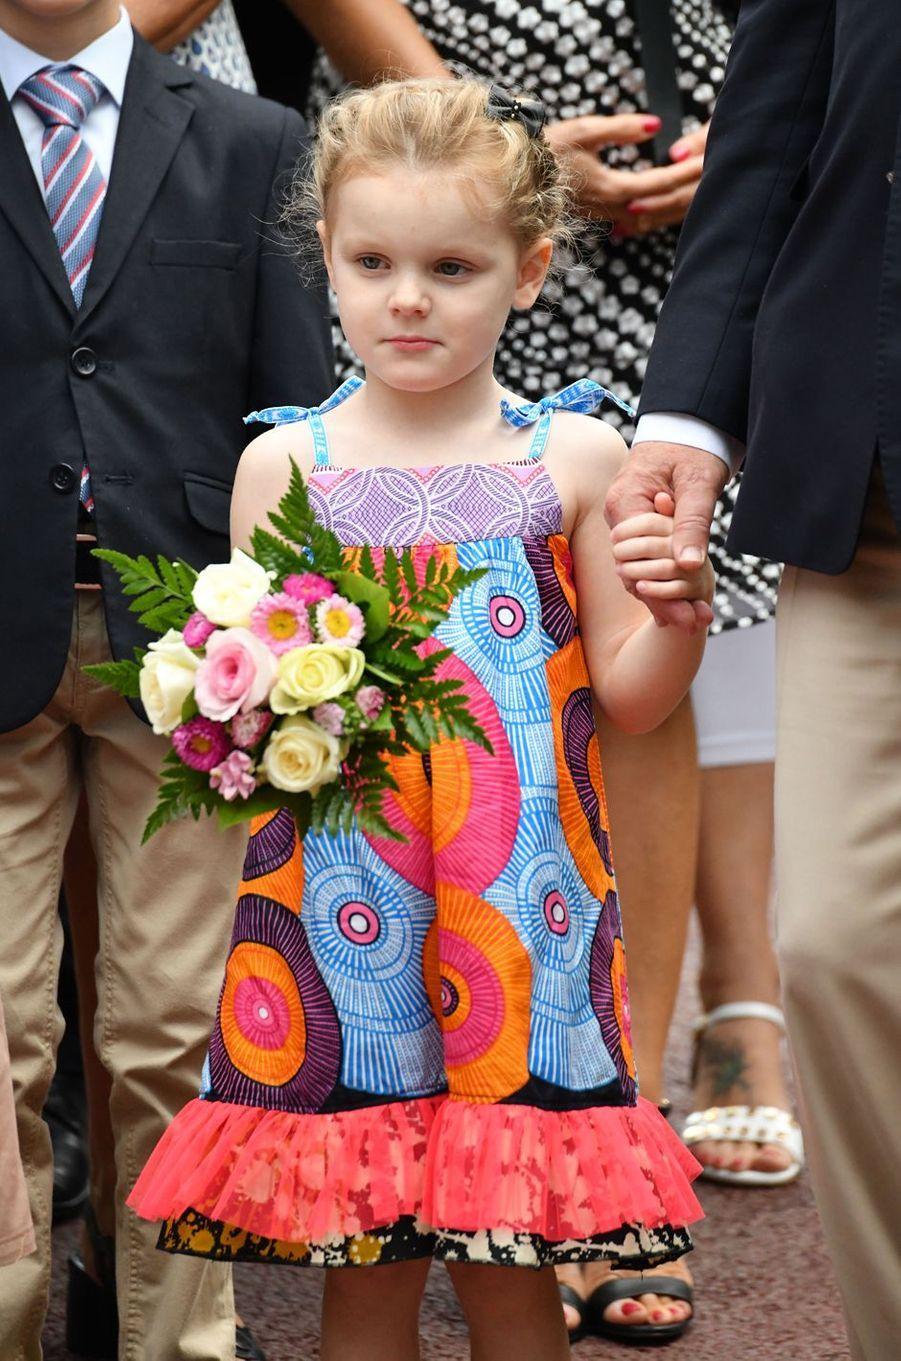 La princesse Gabriella de Monaco à Monaco, le 6 septembre 2019